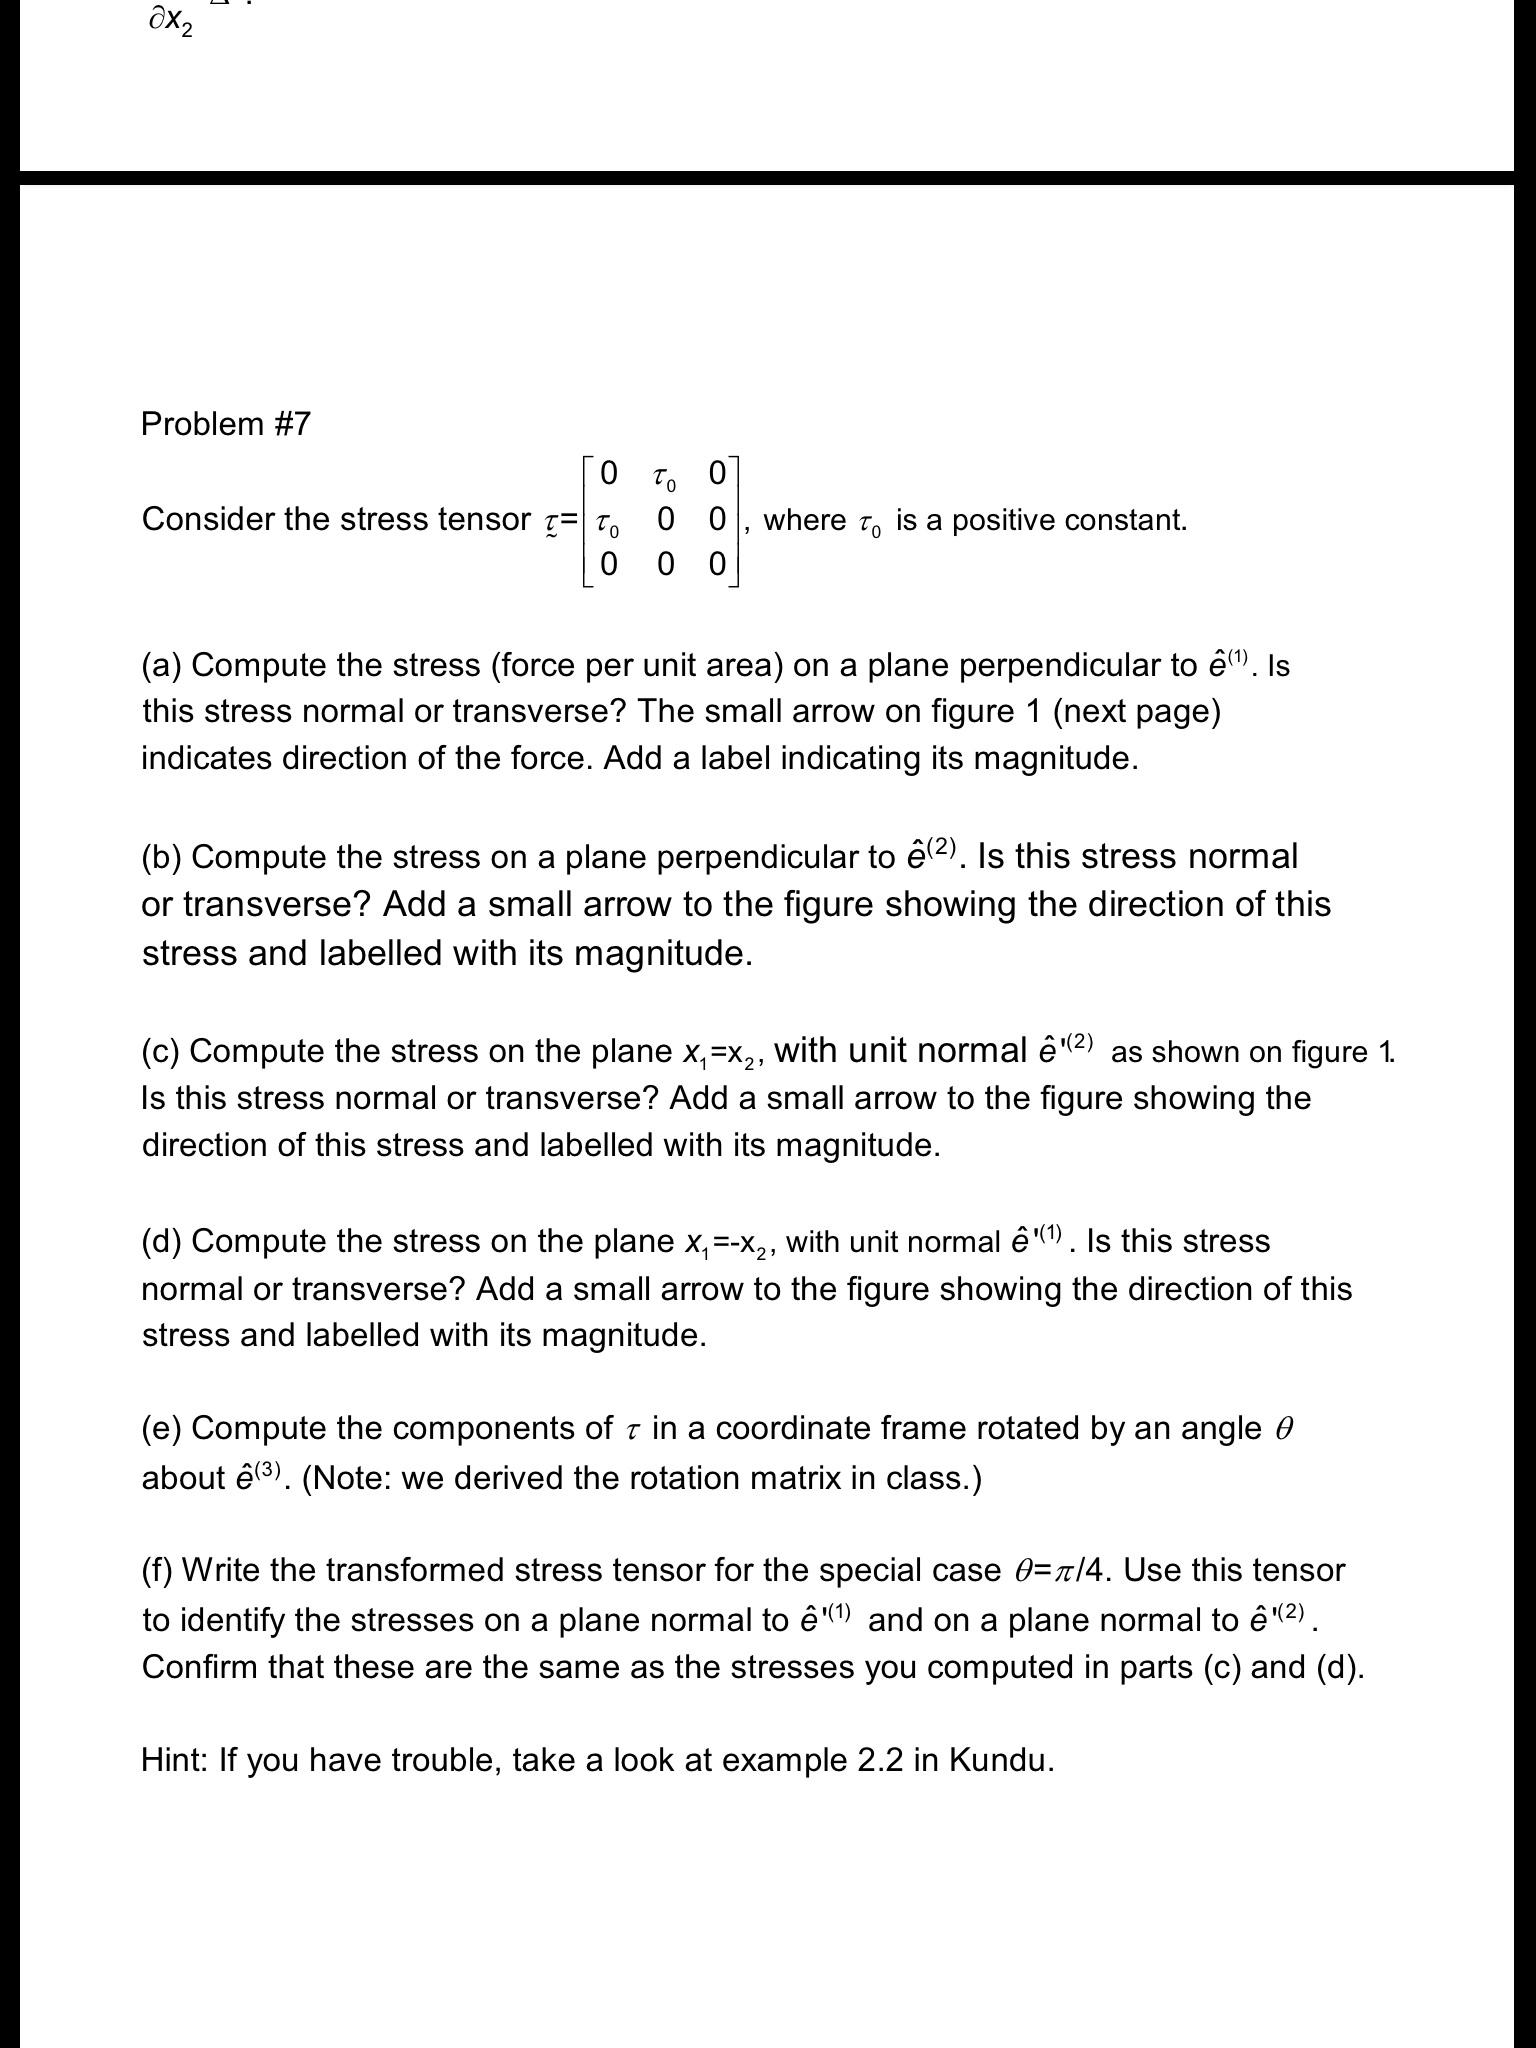 how to get tensor value tensorflo